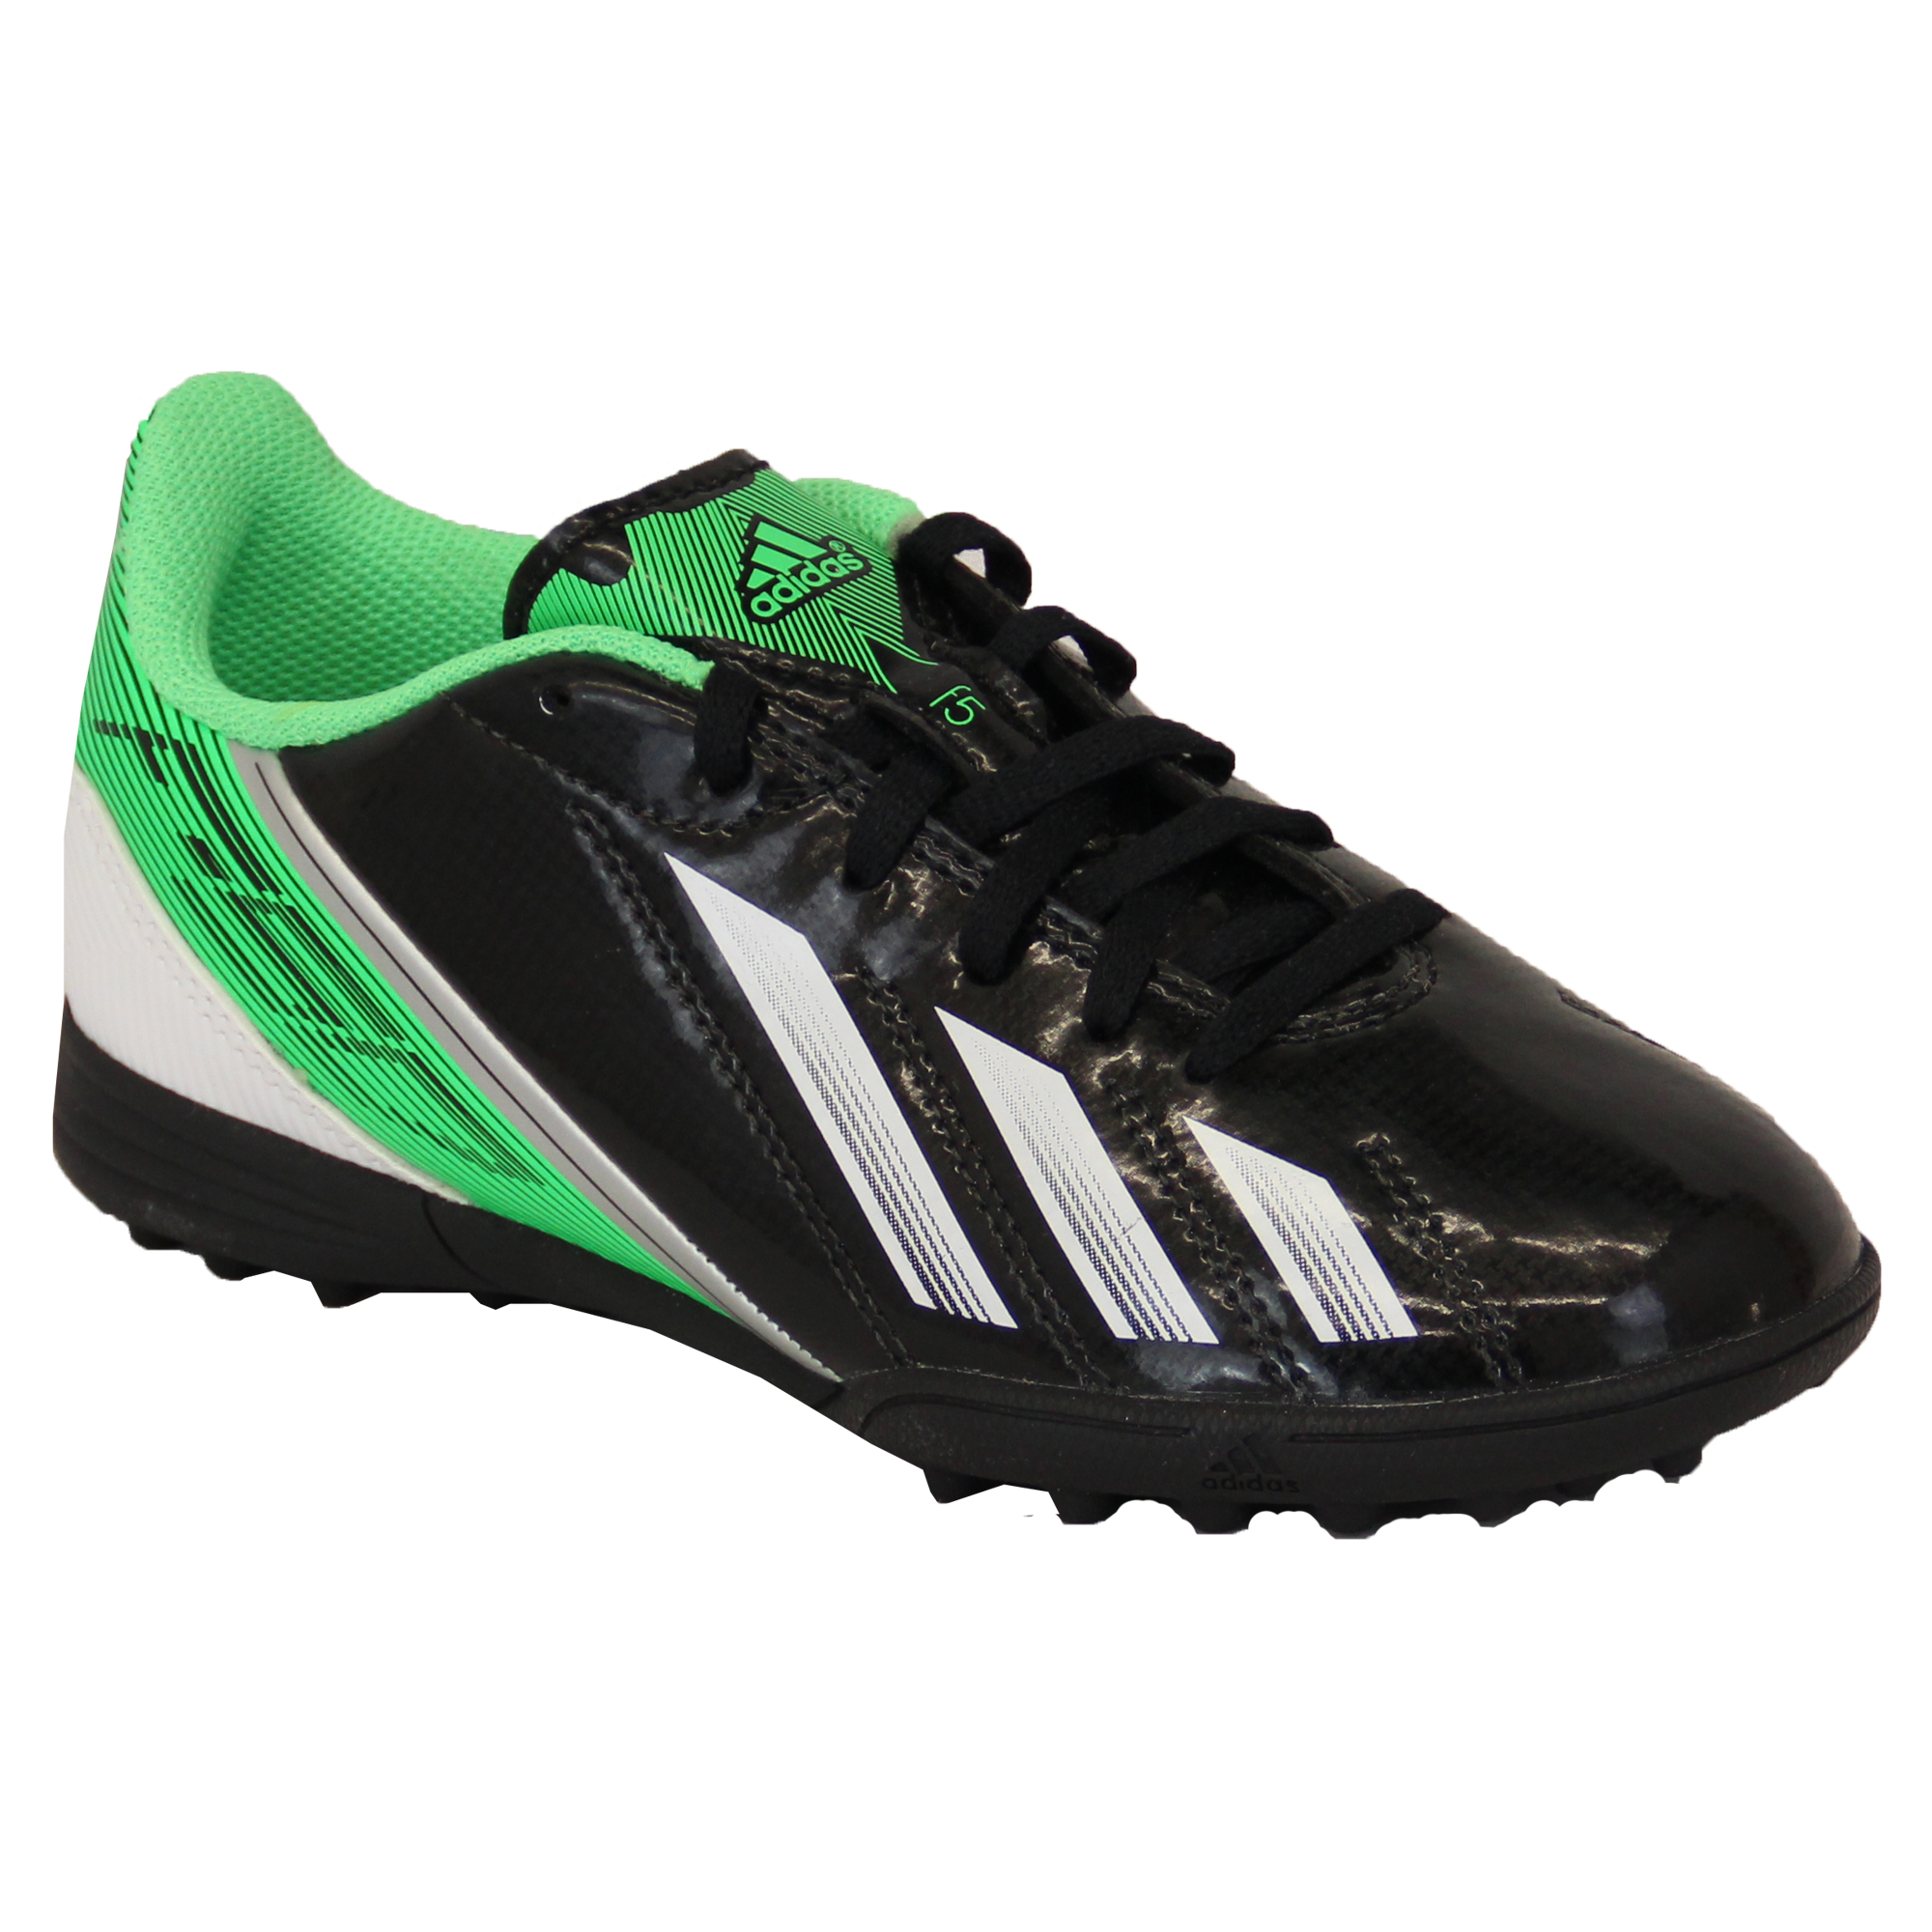 buy popular adc59 76e73 Boys-ADIDAS-Trainers-Kids-Football-Soccer-Astro-Turf-